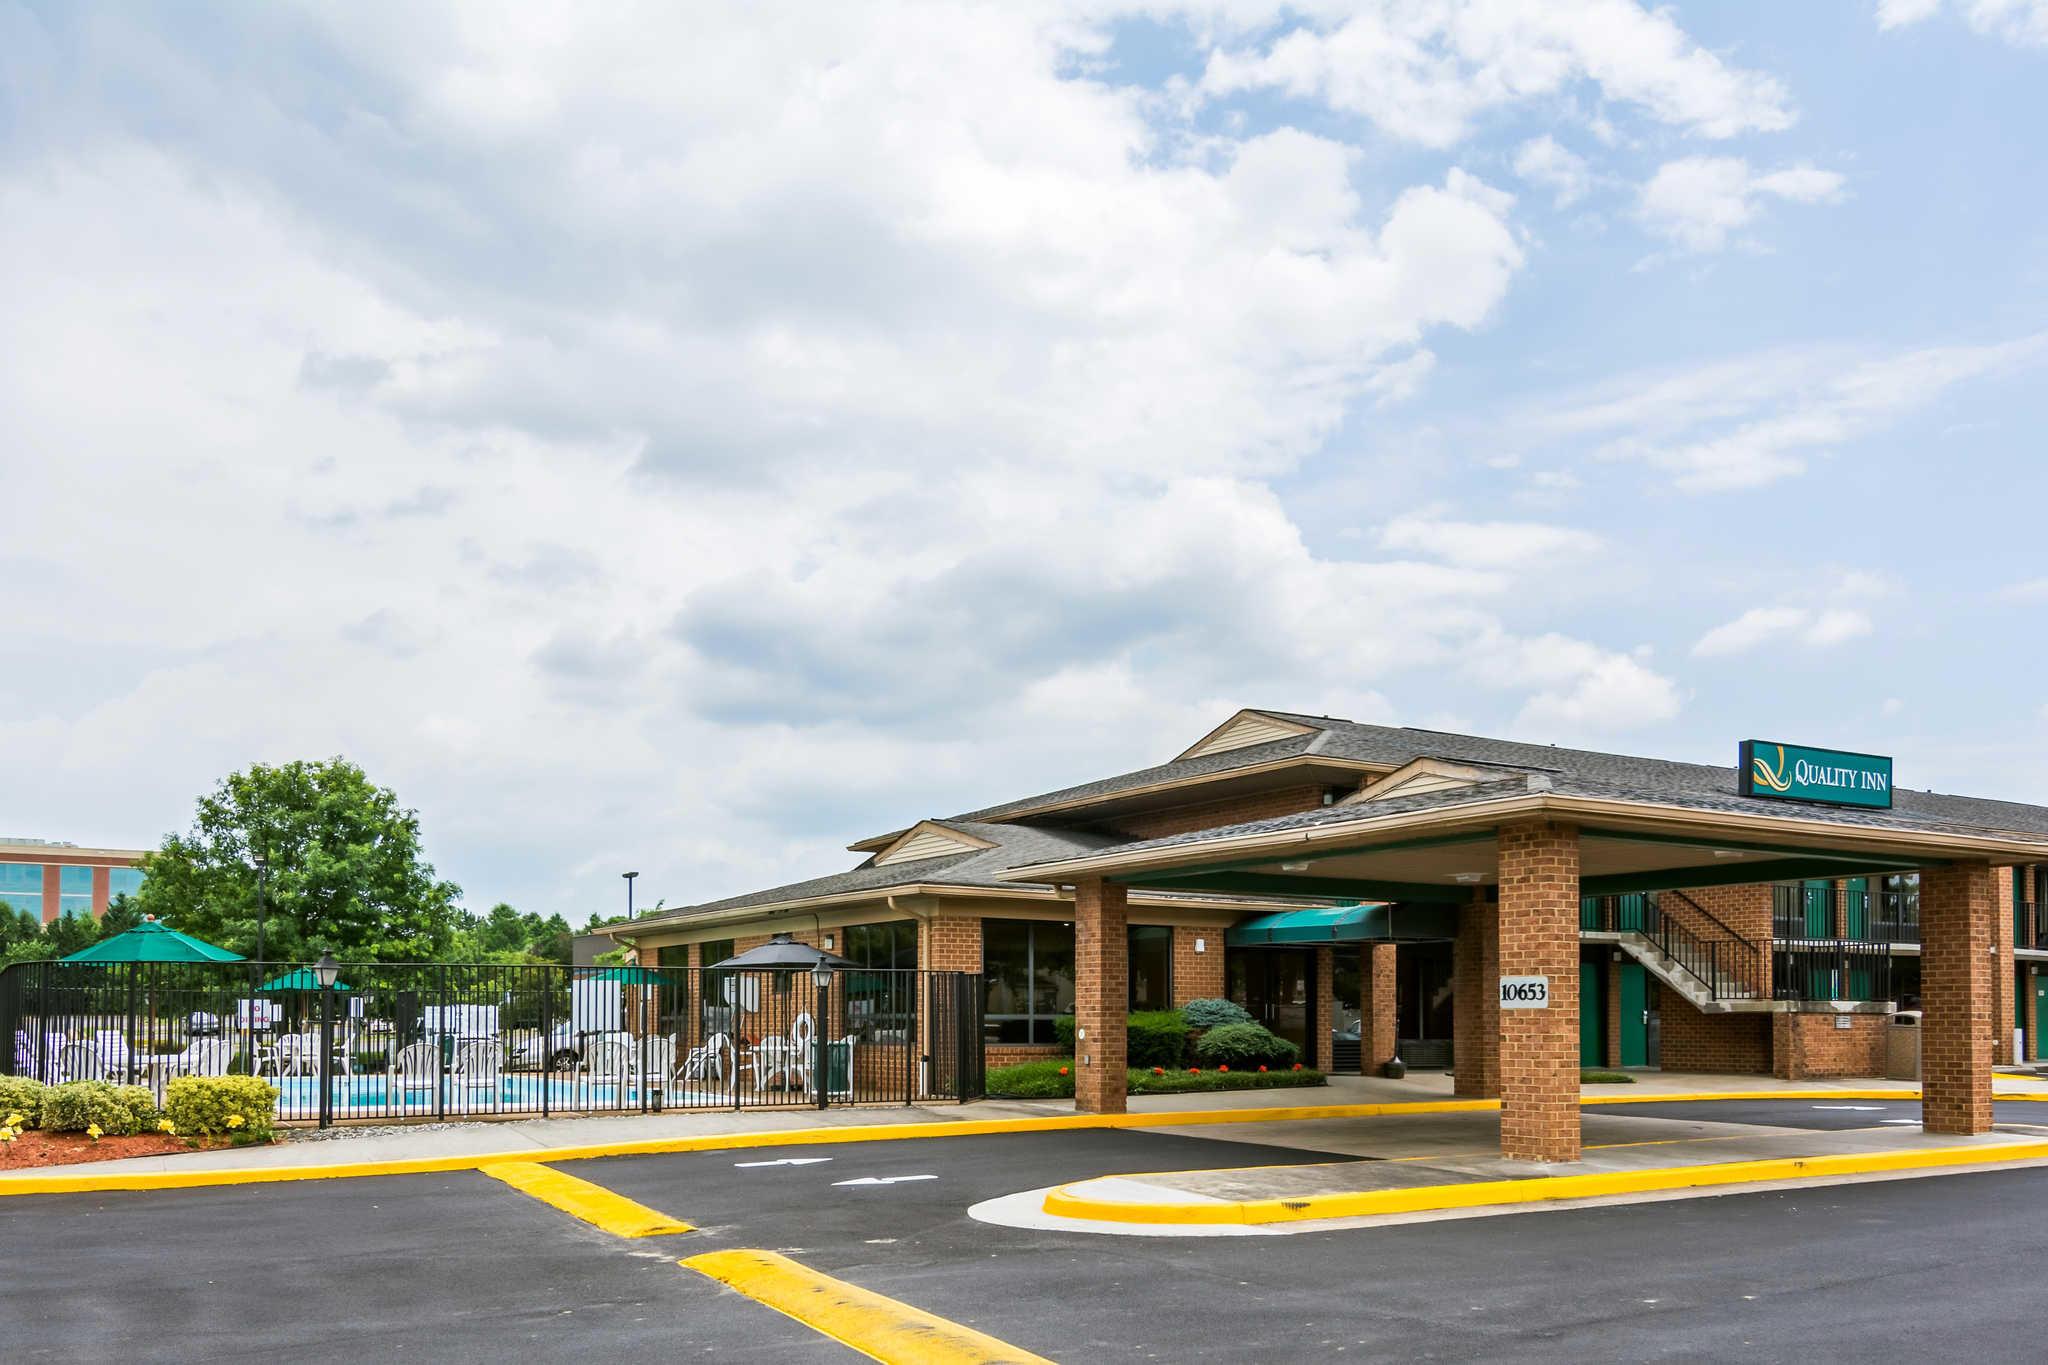 Quality Inn At 10653 Balls Ford Rd Manassas Va On Fave